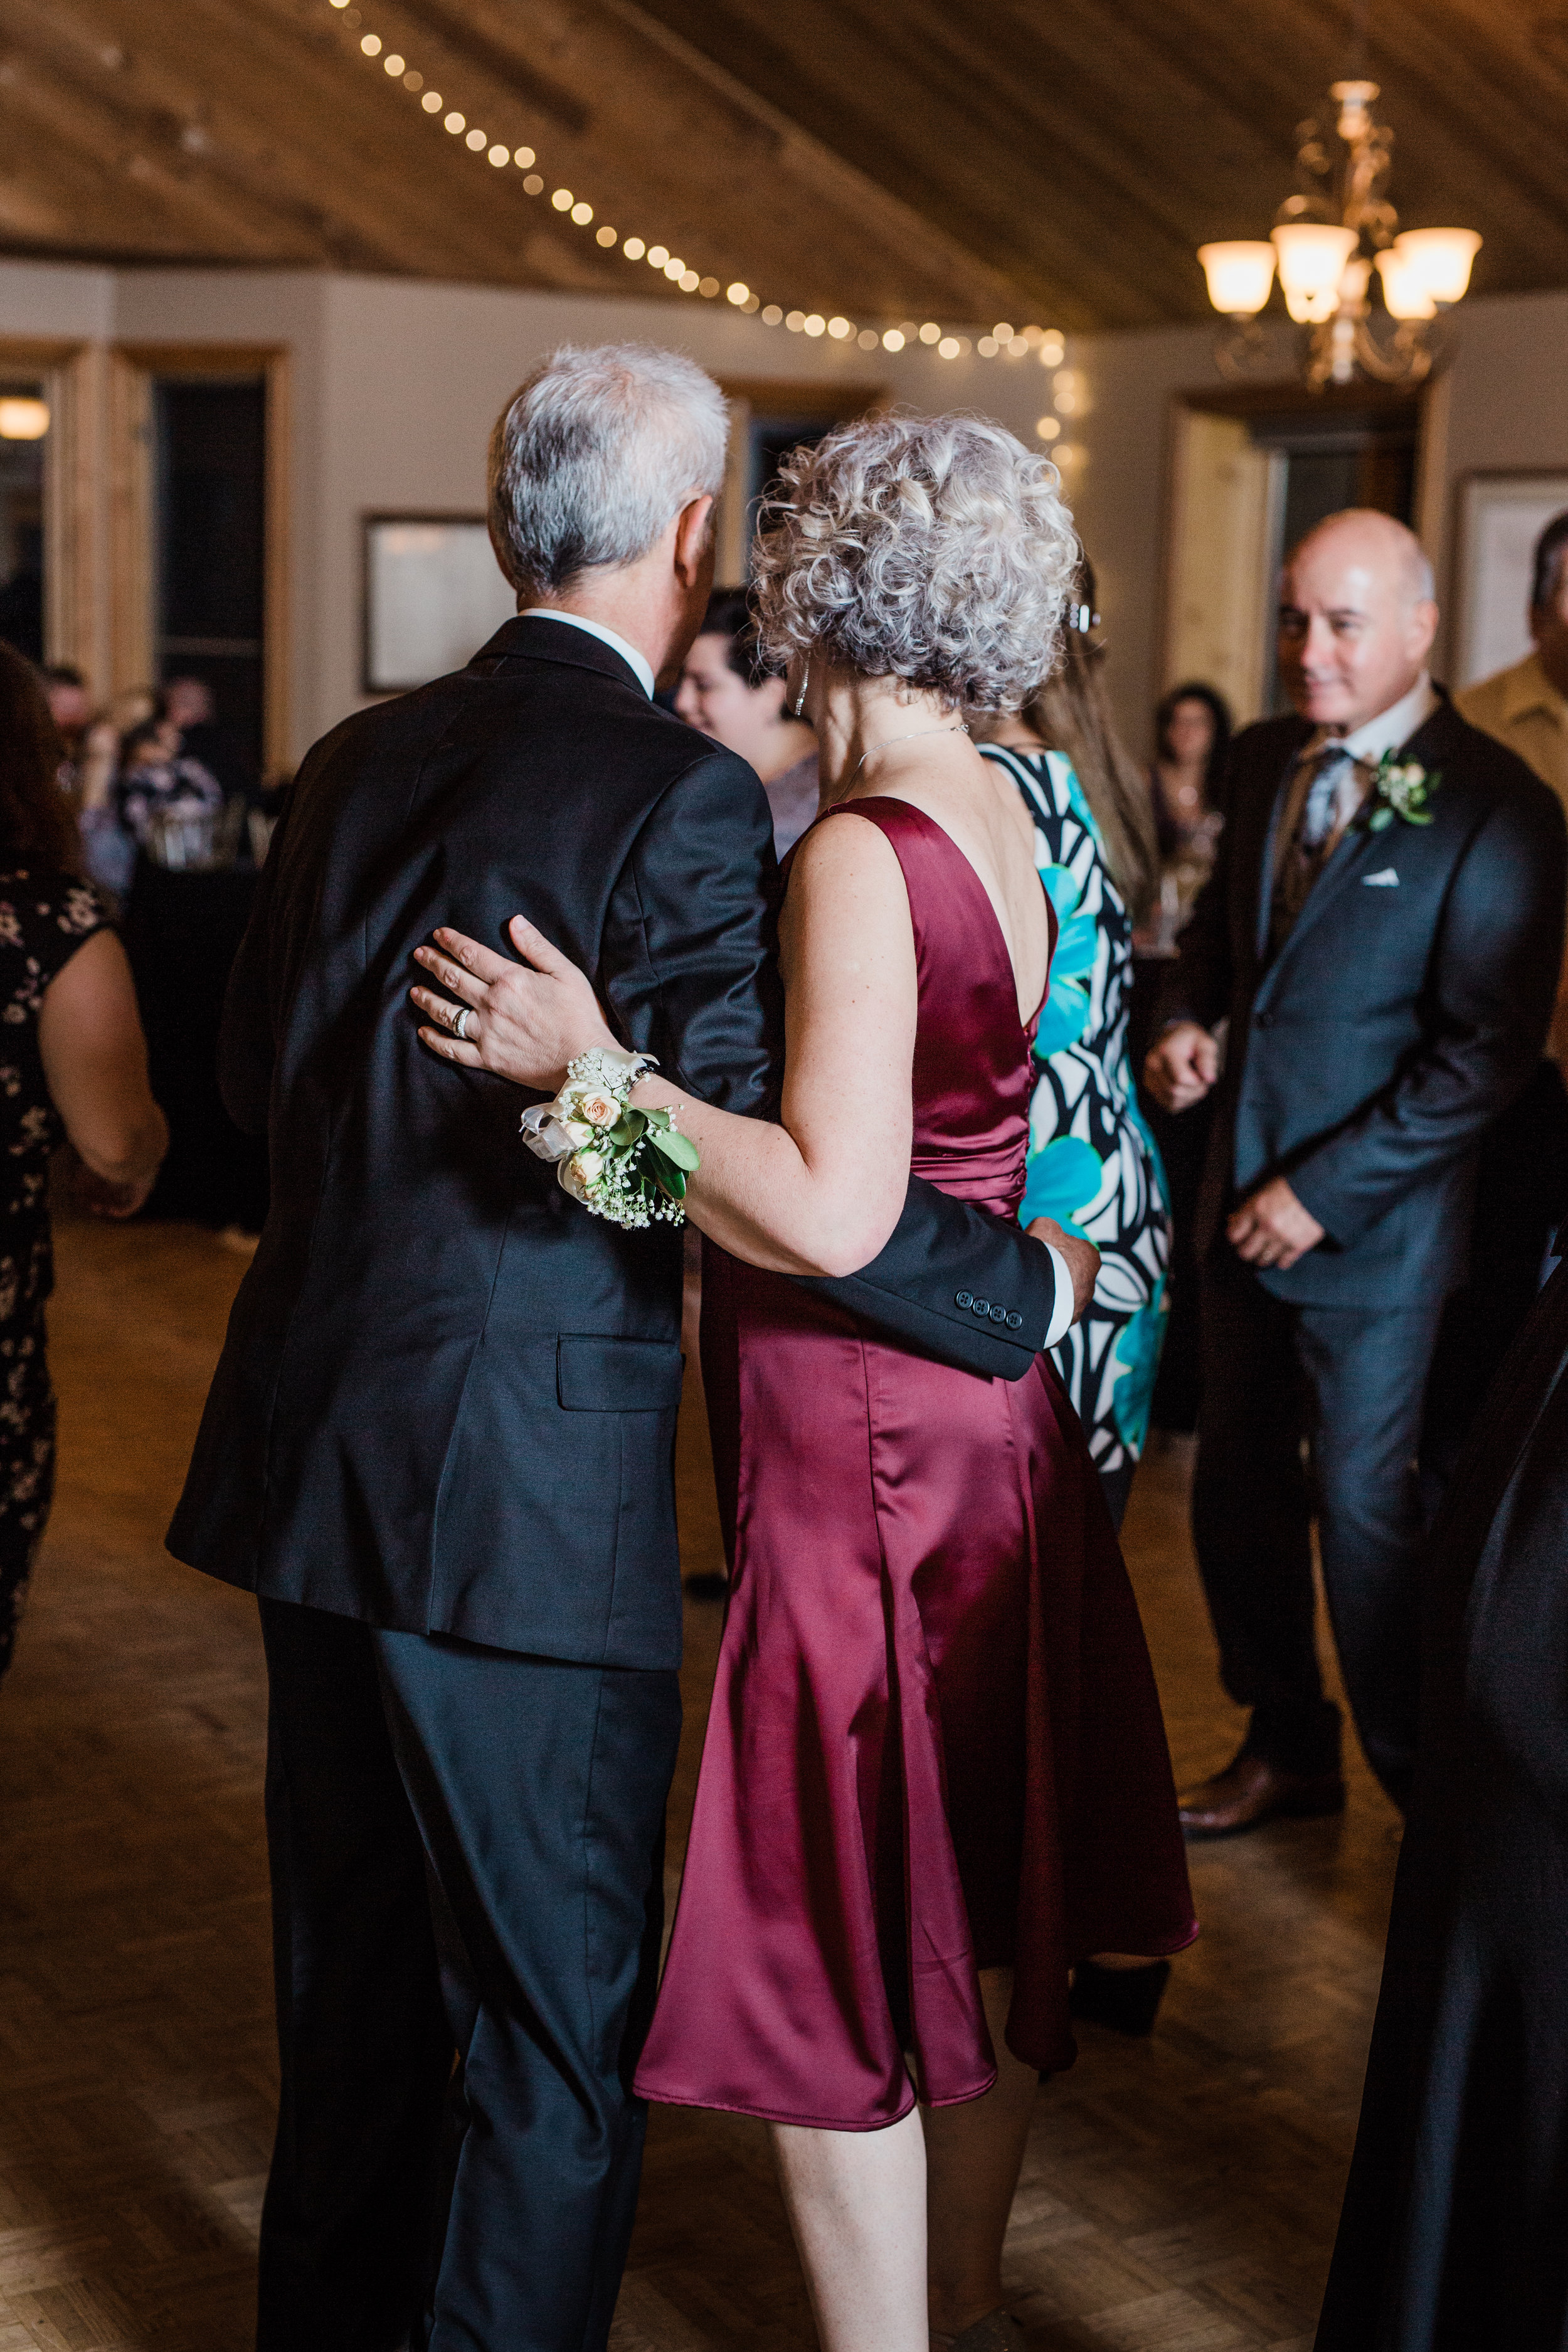 Amir-Golbazi-Danielle-Giroux-Photography_Toronto-Wedding_Cedarwood_Rachel-Paul_811.jpg